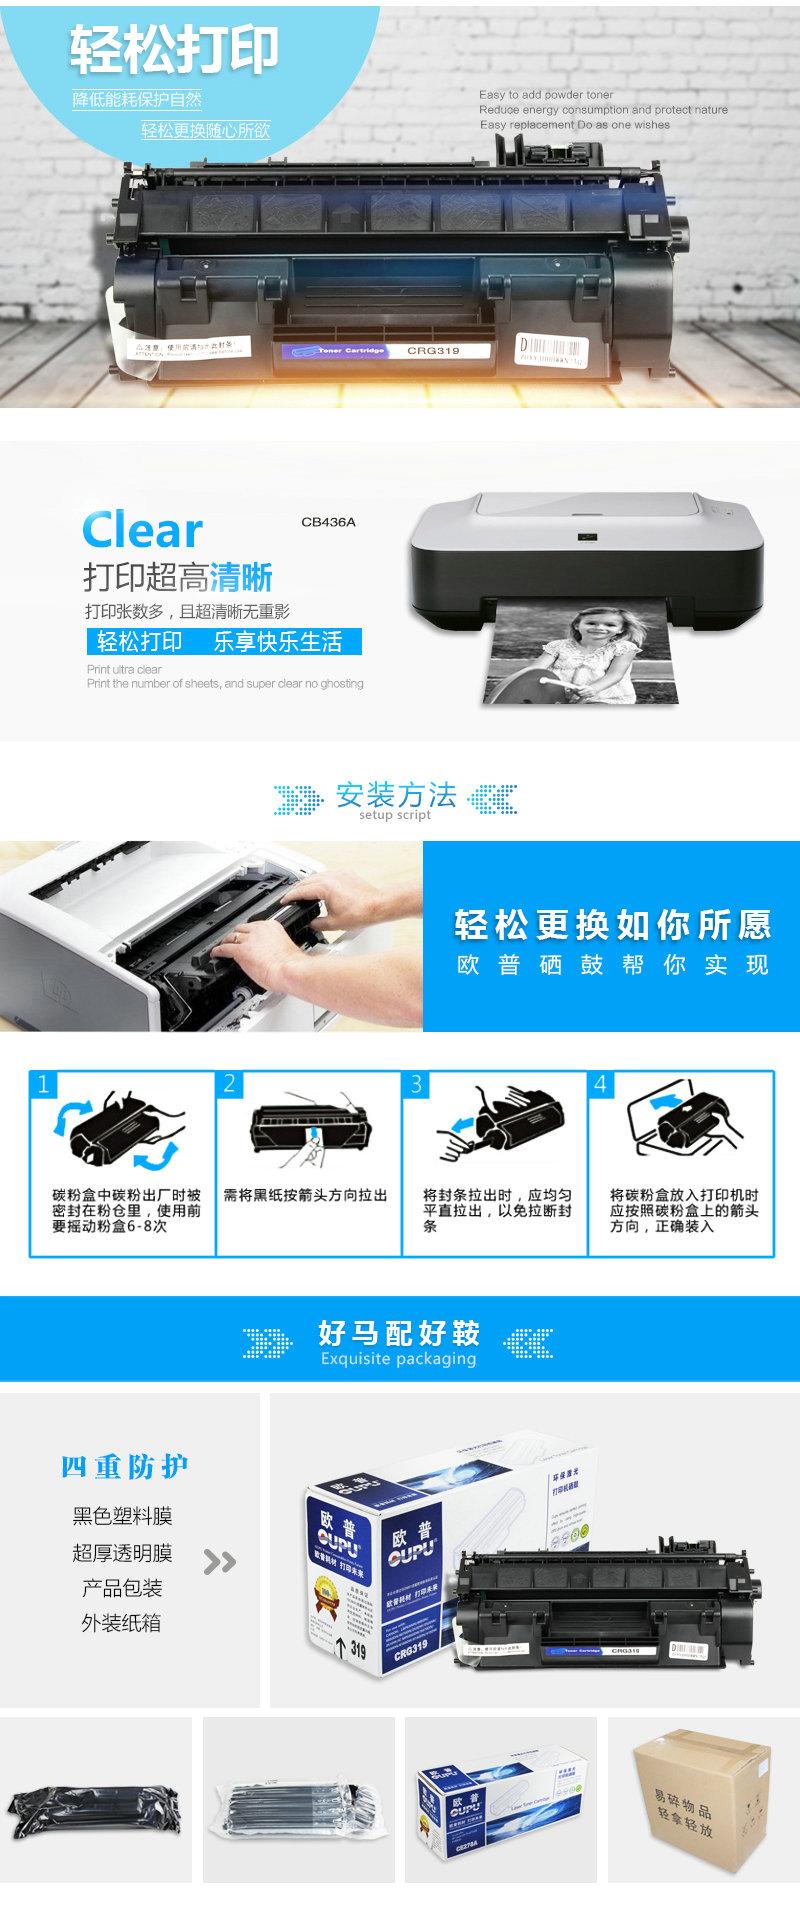 manbetx万博体育平台CRG319万博manbetx官网manbetx手机版 - 登陆普通02